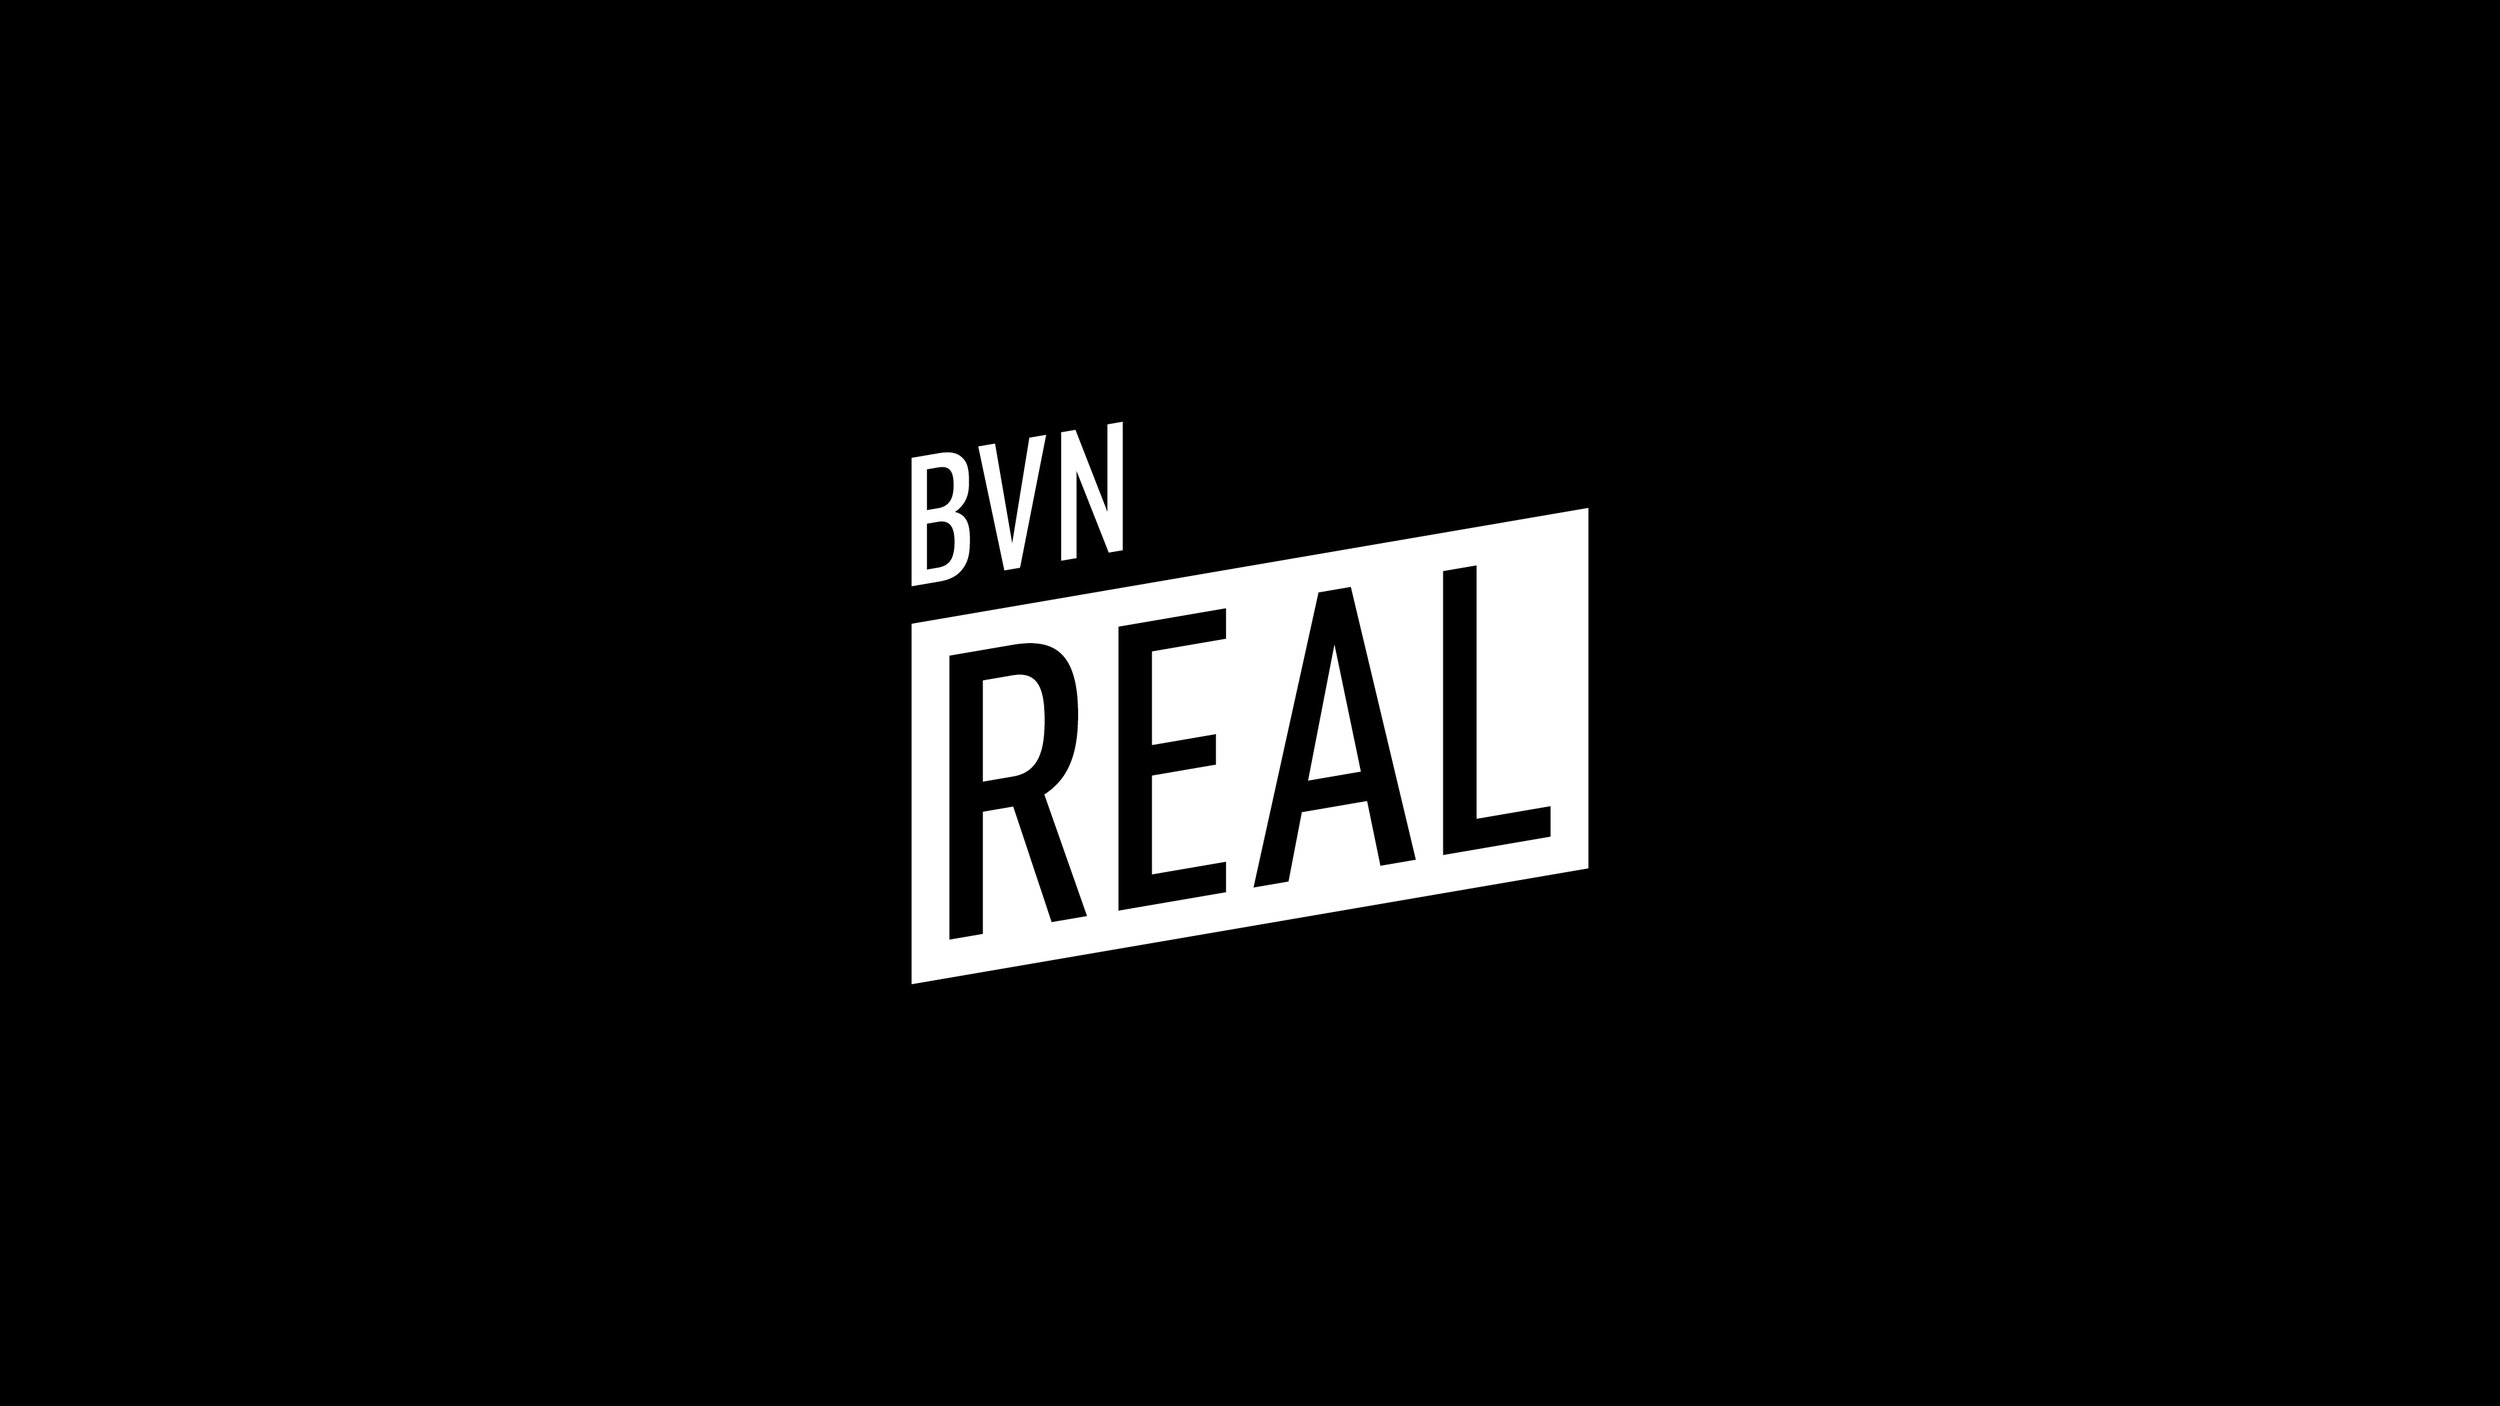 BVN REAL_3840x2160.jpg